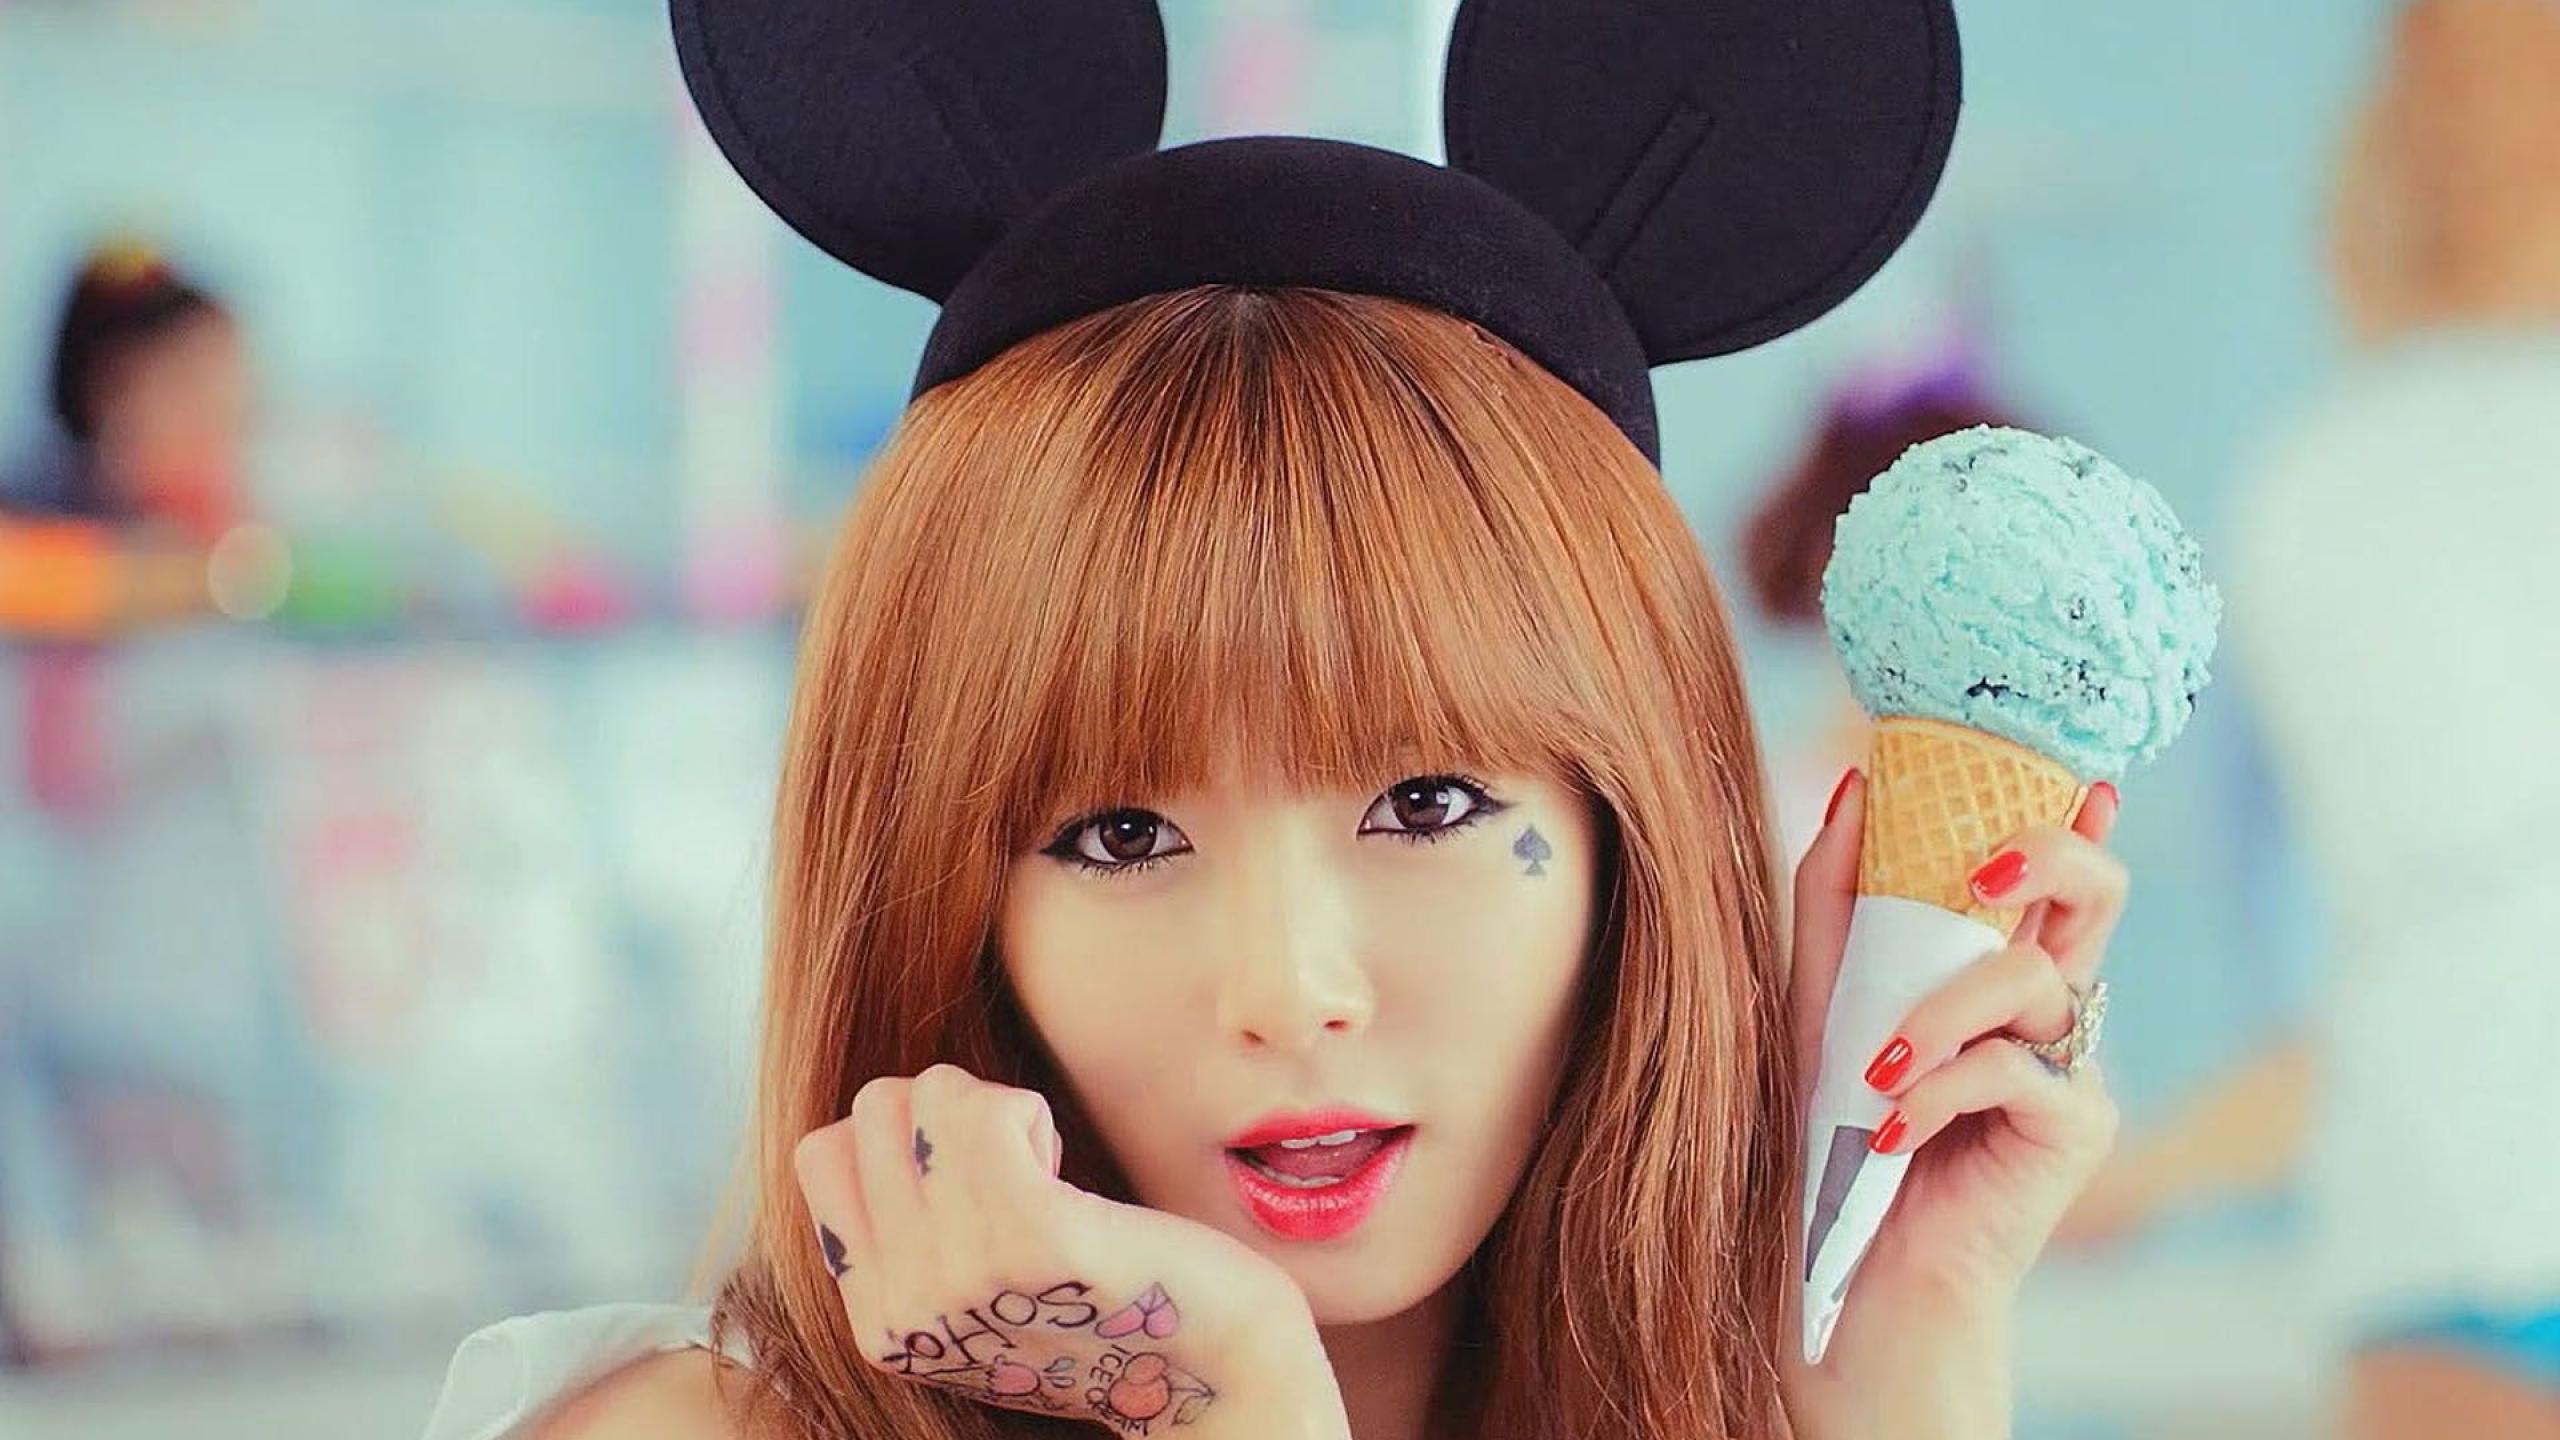 Hyuna-Ice-Cream-hyuna-33911460-2560-1440.jpg